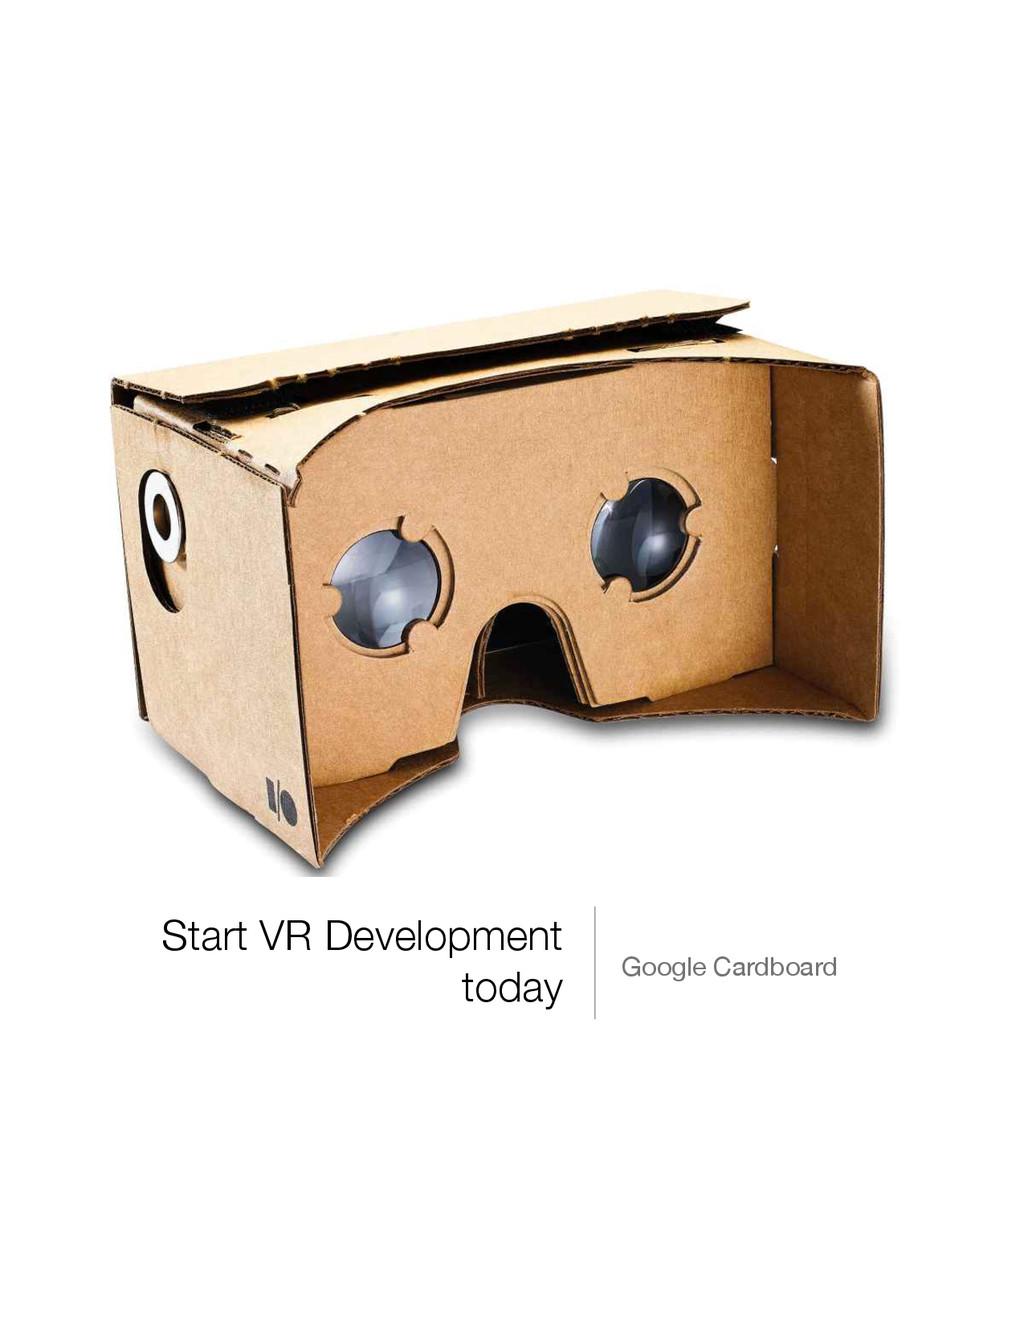 Start VR Development today Google Cardboard